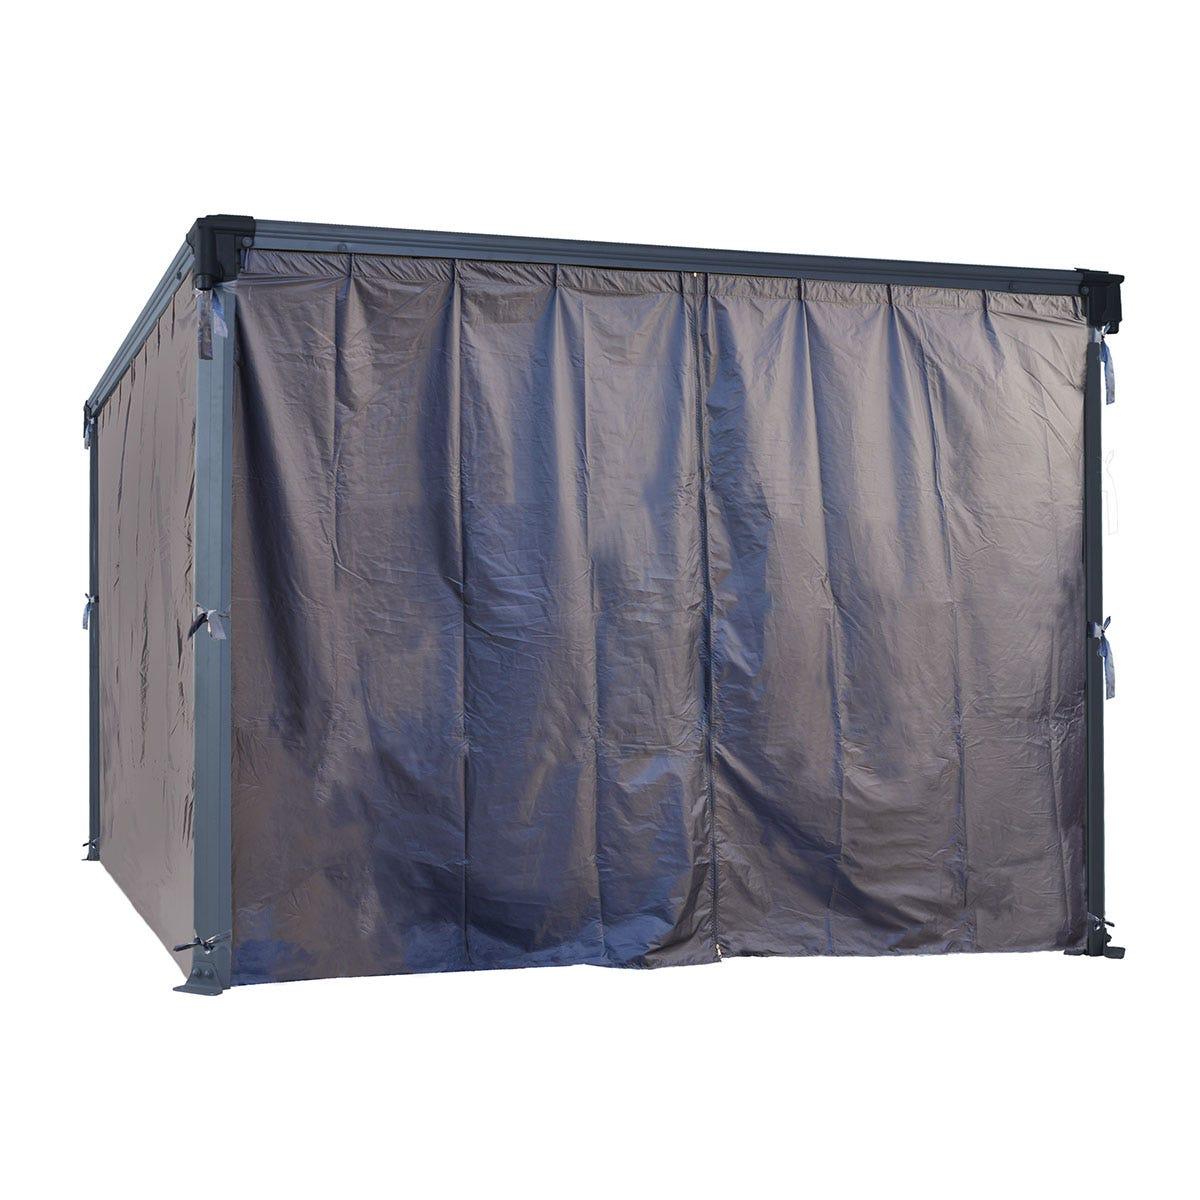 Palram - Canopia Square Gazebo Curtain Set - Black